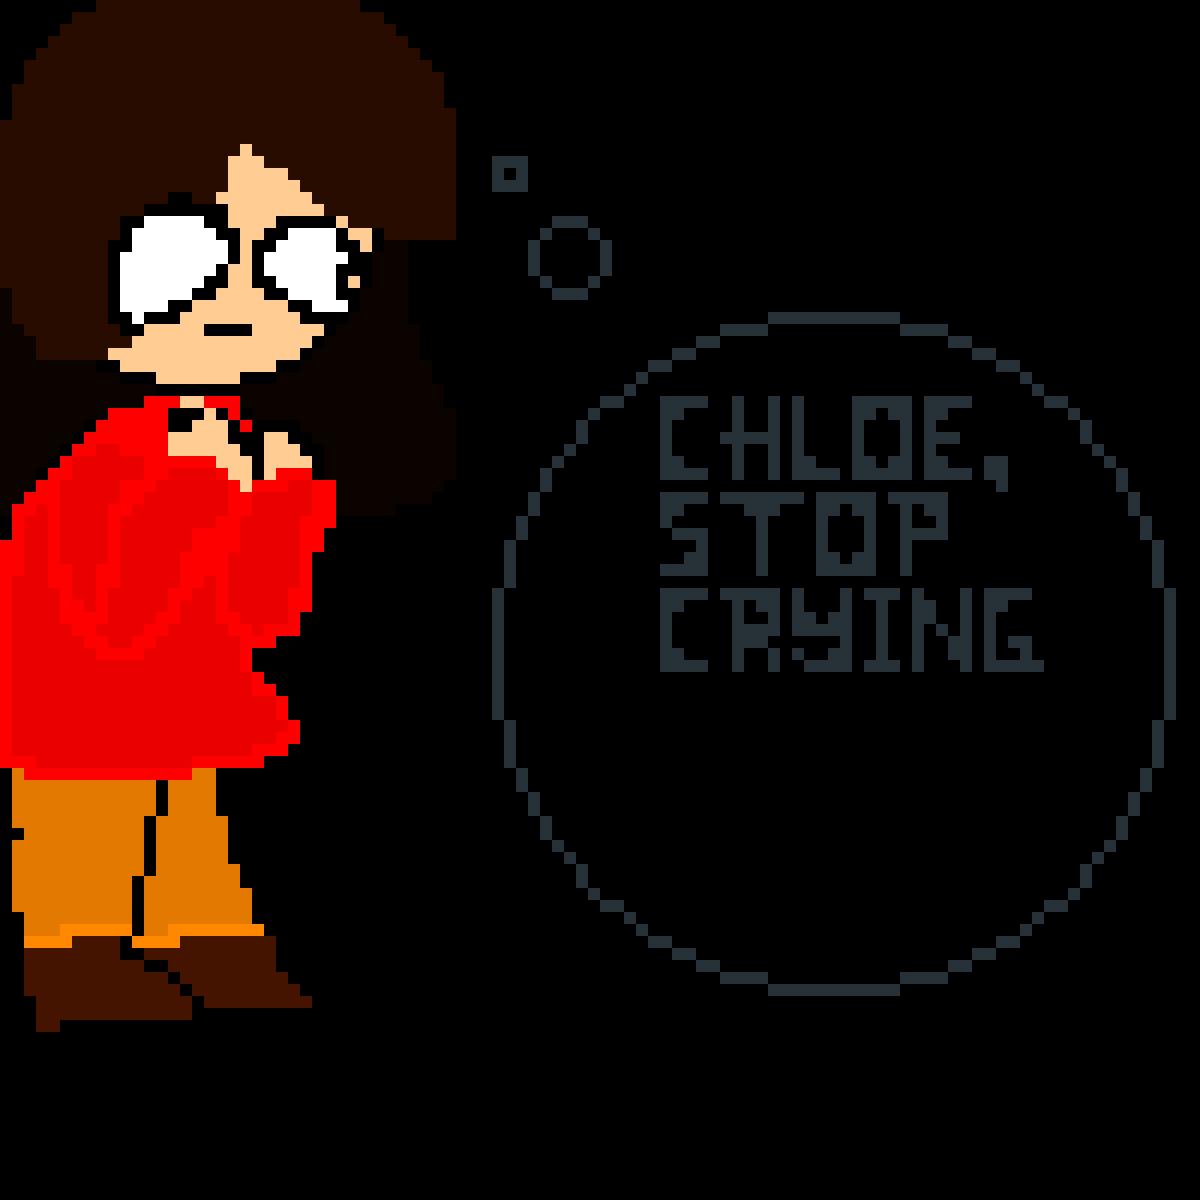 WAAAAAAAAAAAAAAAAAAAAAAAA by ChloeFire